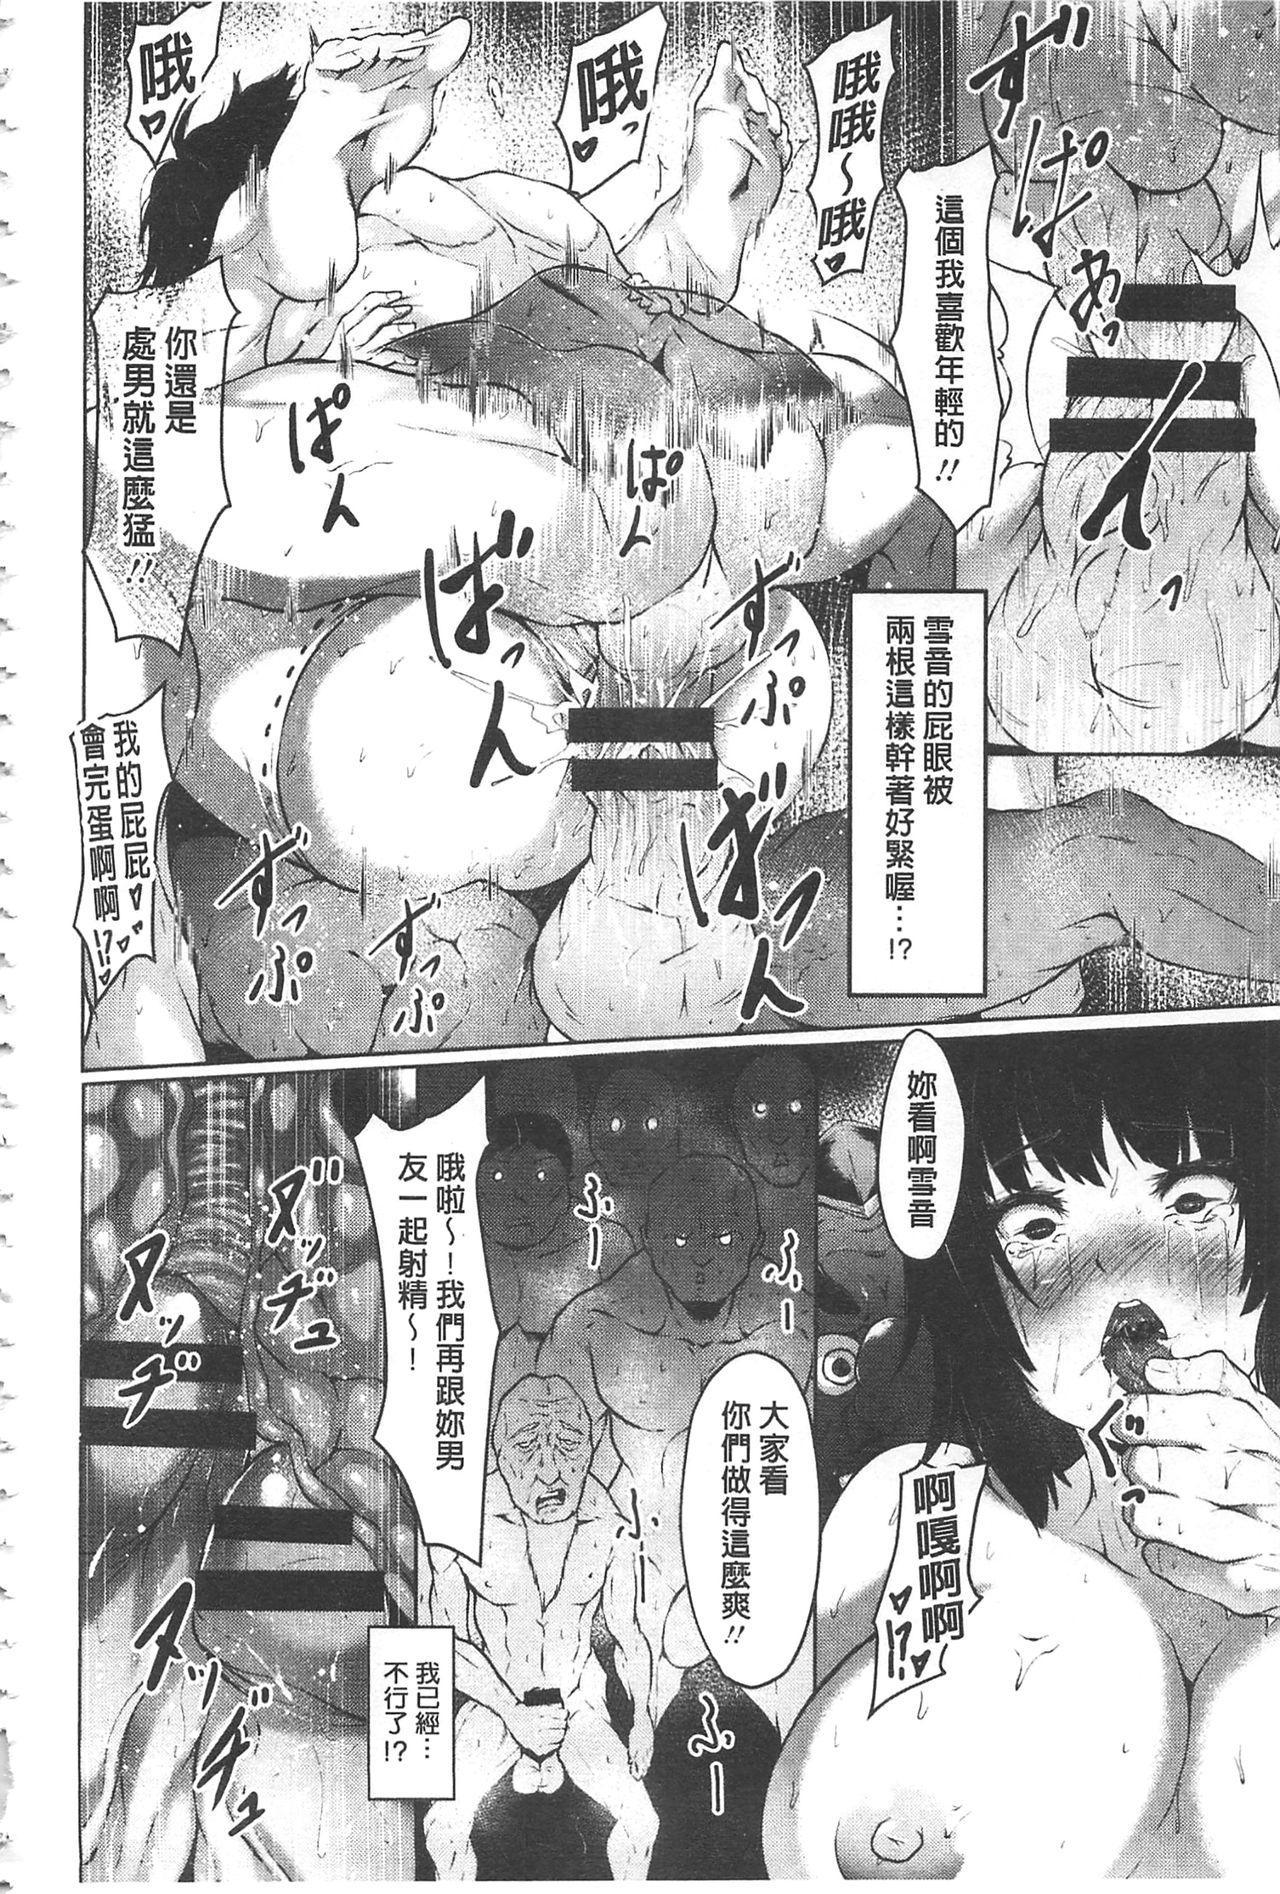 [Lorica] Biinkan Anal ~Kakusei Nejikomi Ana~ | 美淫感猥菊花 塞入擴張覺醒穴 [Chinese] 82